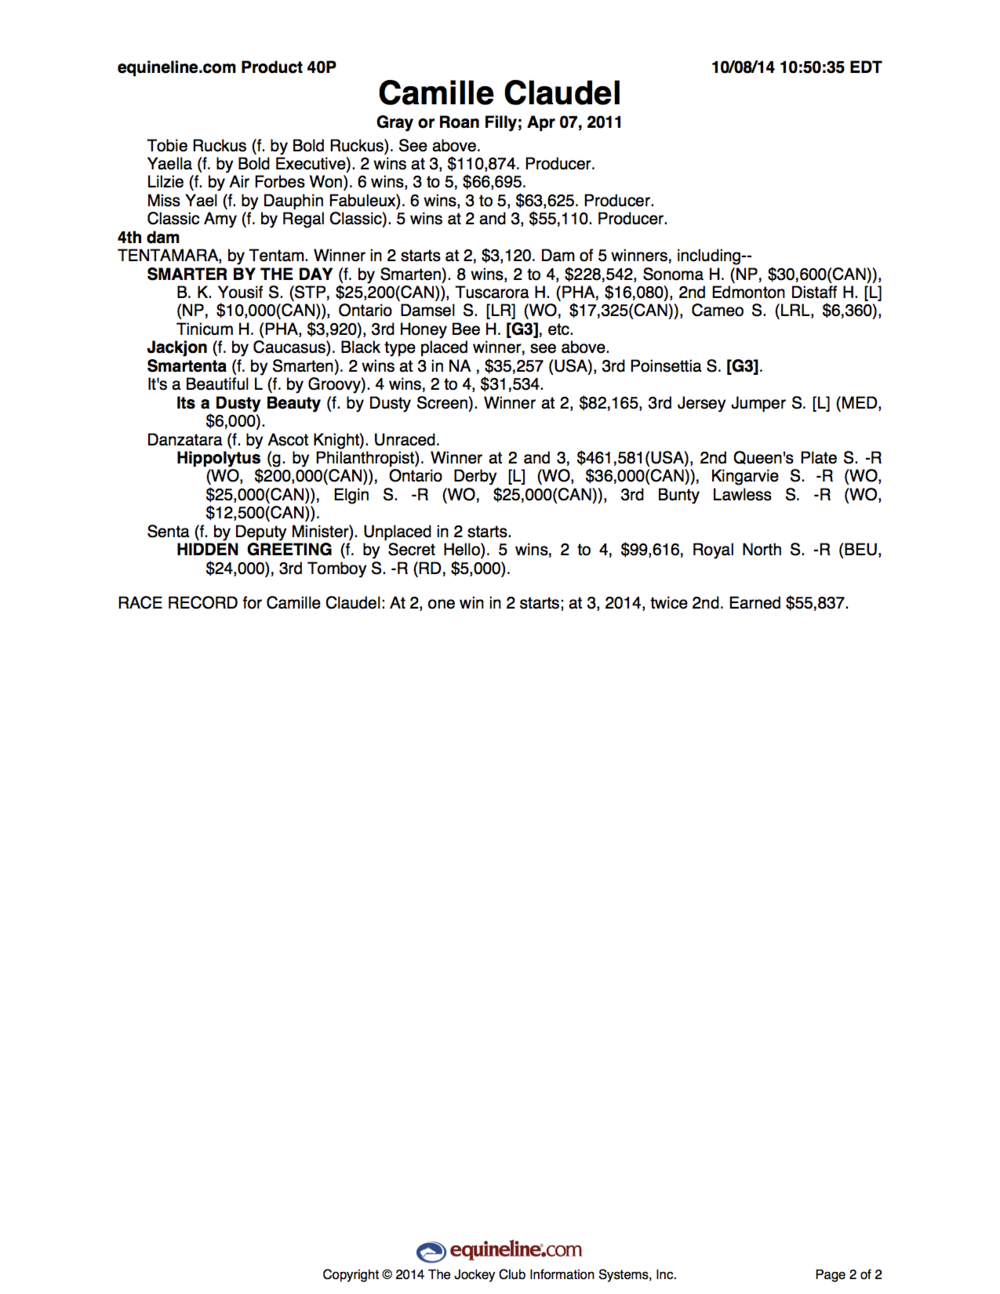 CAMILLE CLAUDEL PEDIGREE pedigree page 2.png